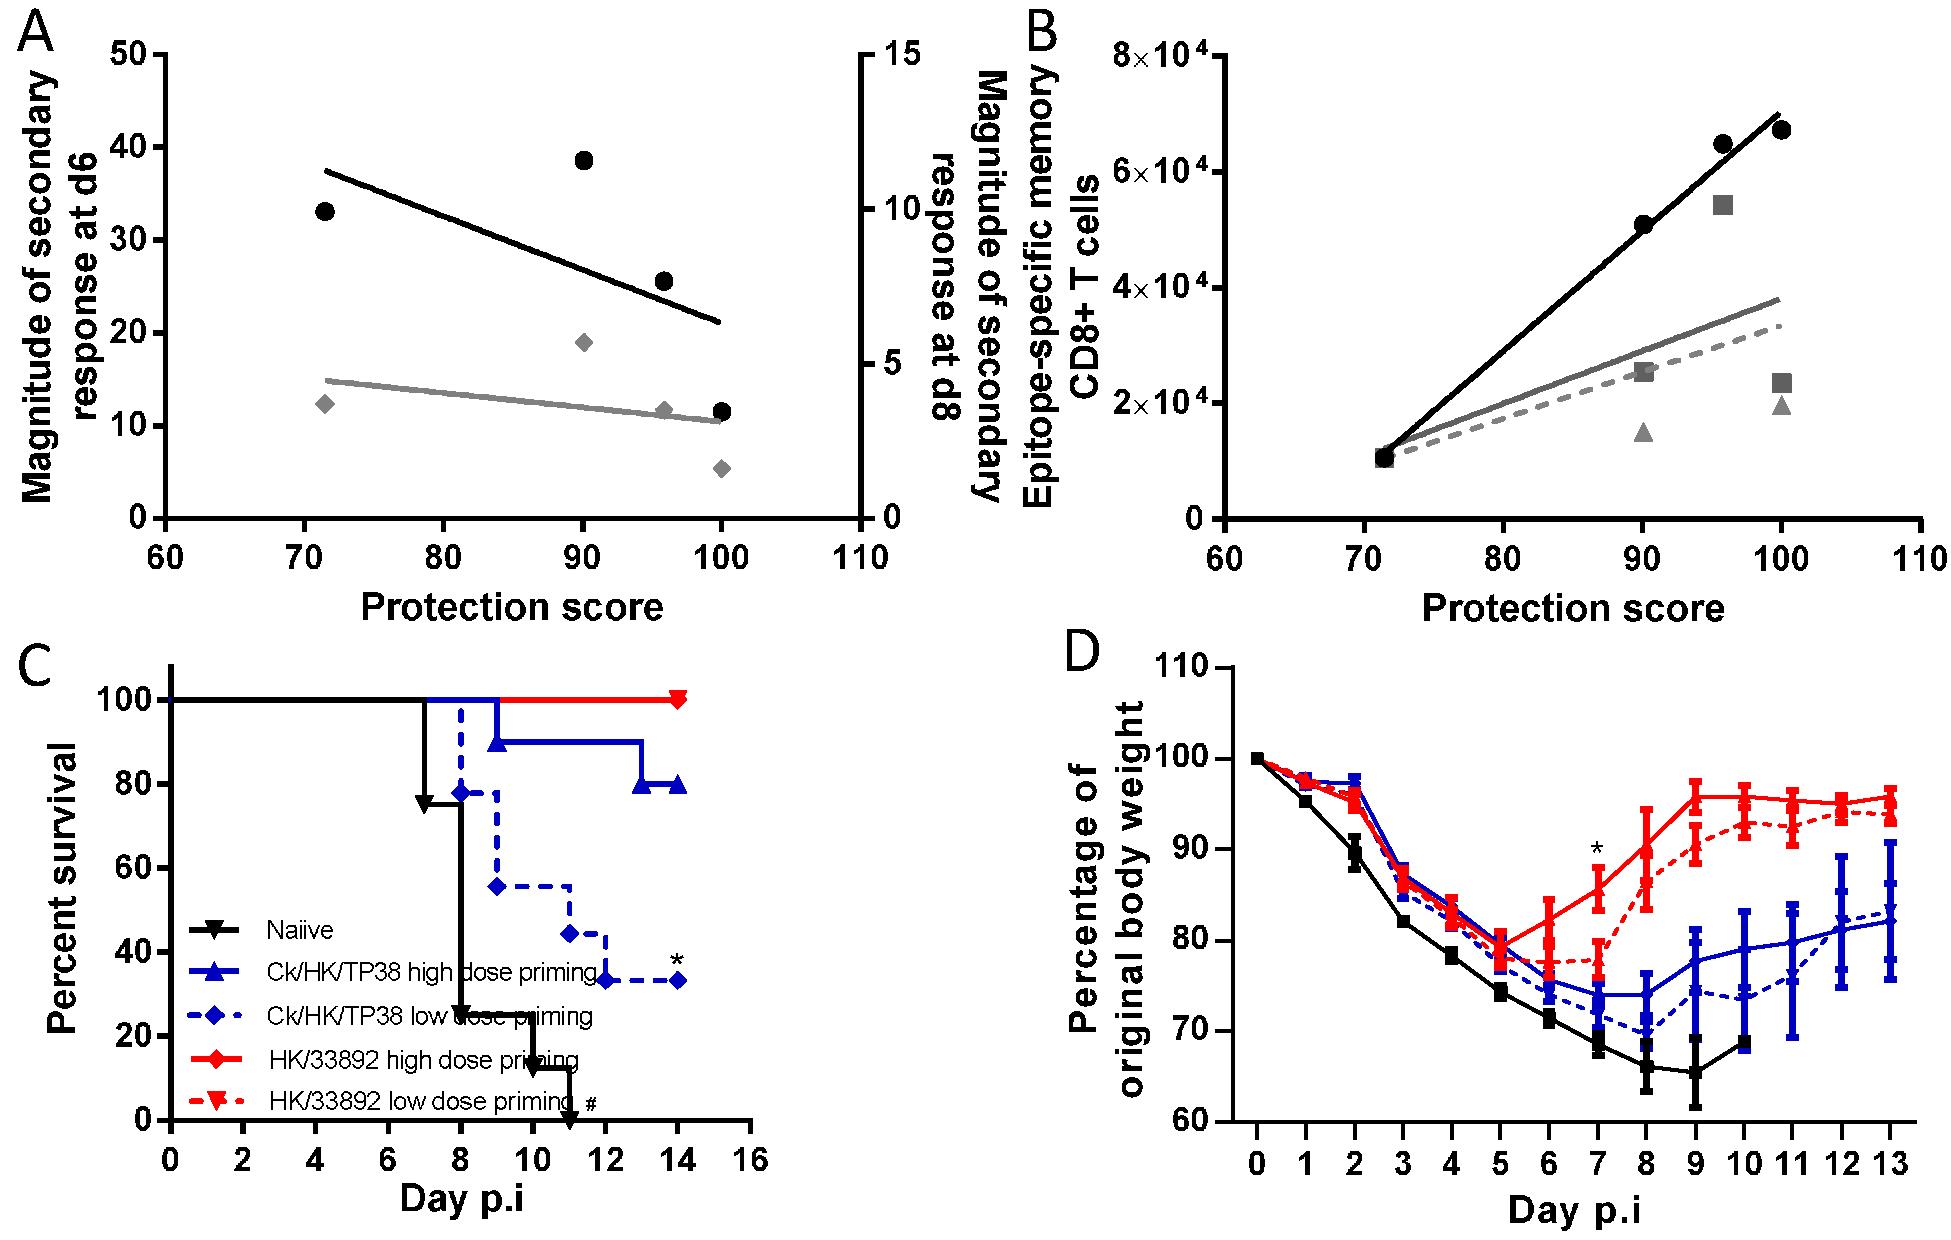 Correlation analysis of the protective efficacy and heterosubtypic immunity.